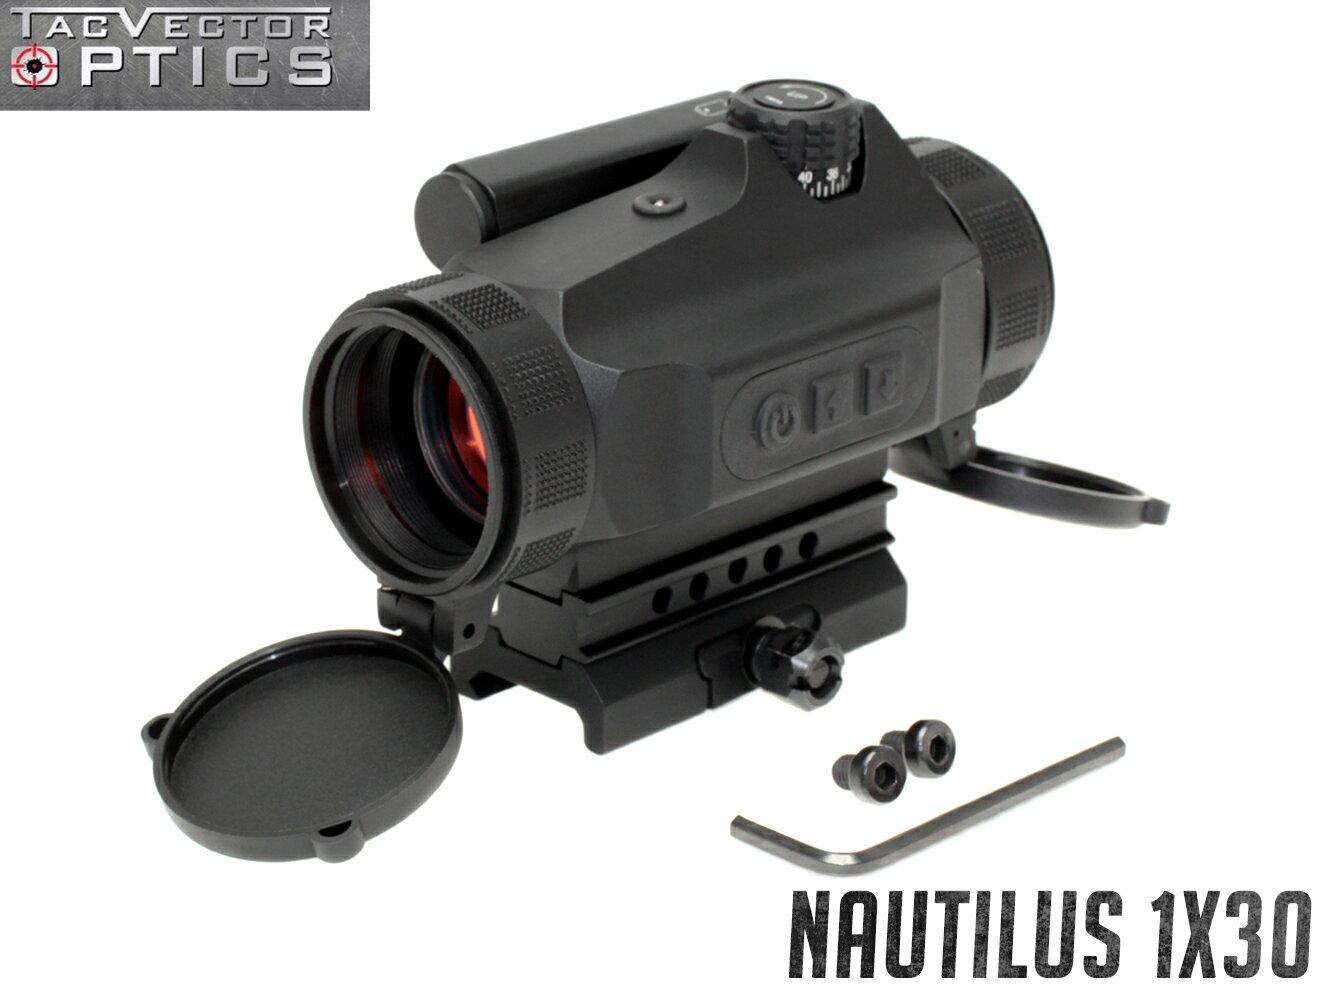 VECTOR OPTICS Nautilus 1x30 レッドドットサイト◆実銃対応 光学サイト 輝度調整可 切り替え式自動調光 20mmレイル対応 耐衝撃 生活防水 マルチコートレンズ